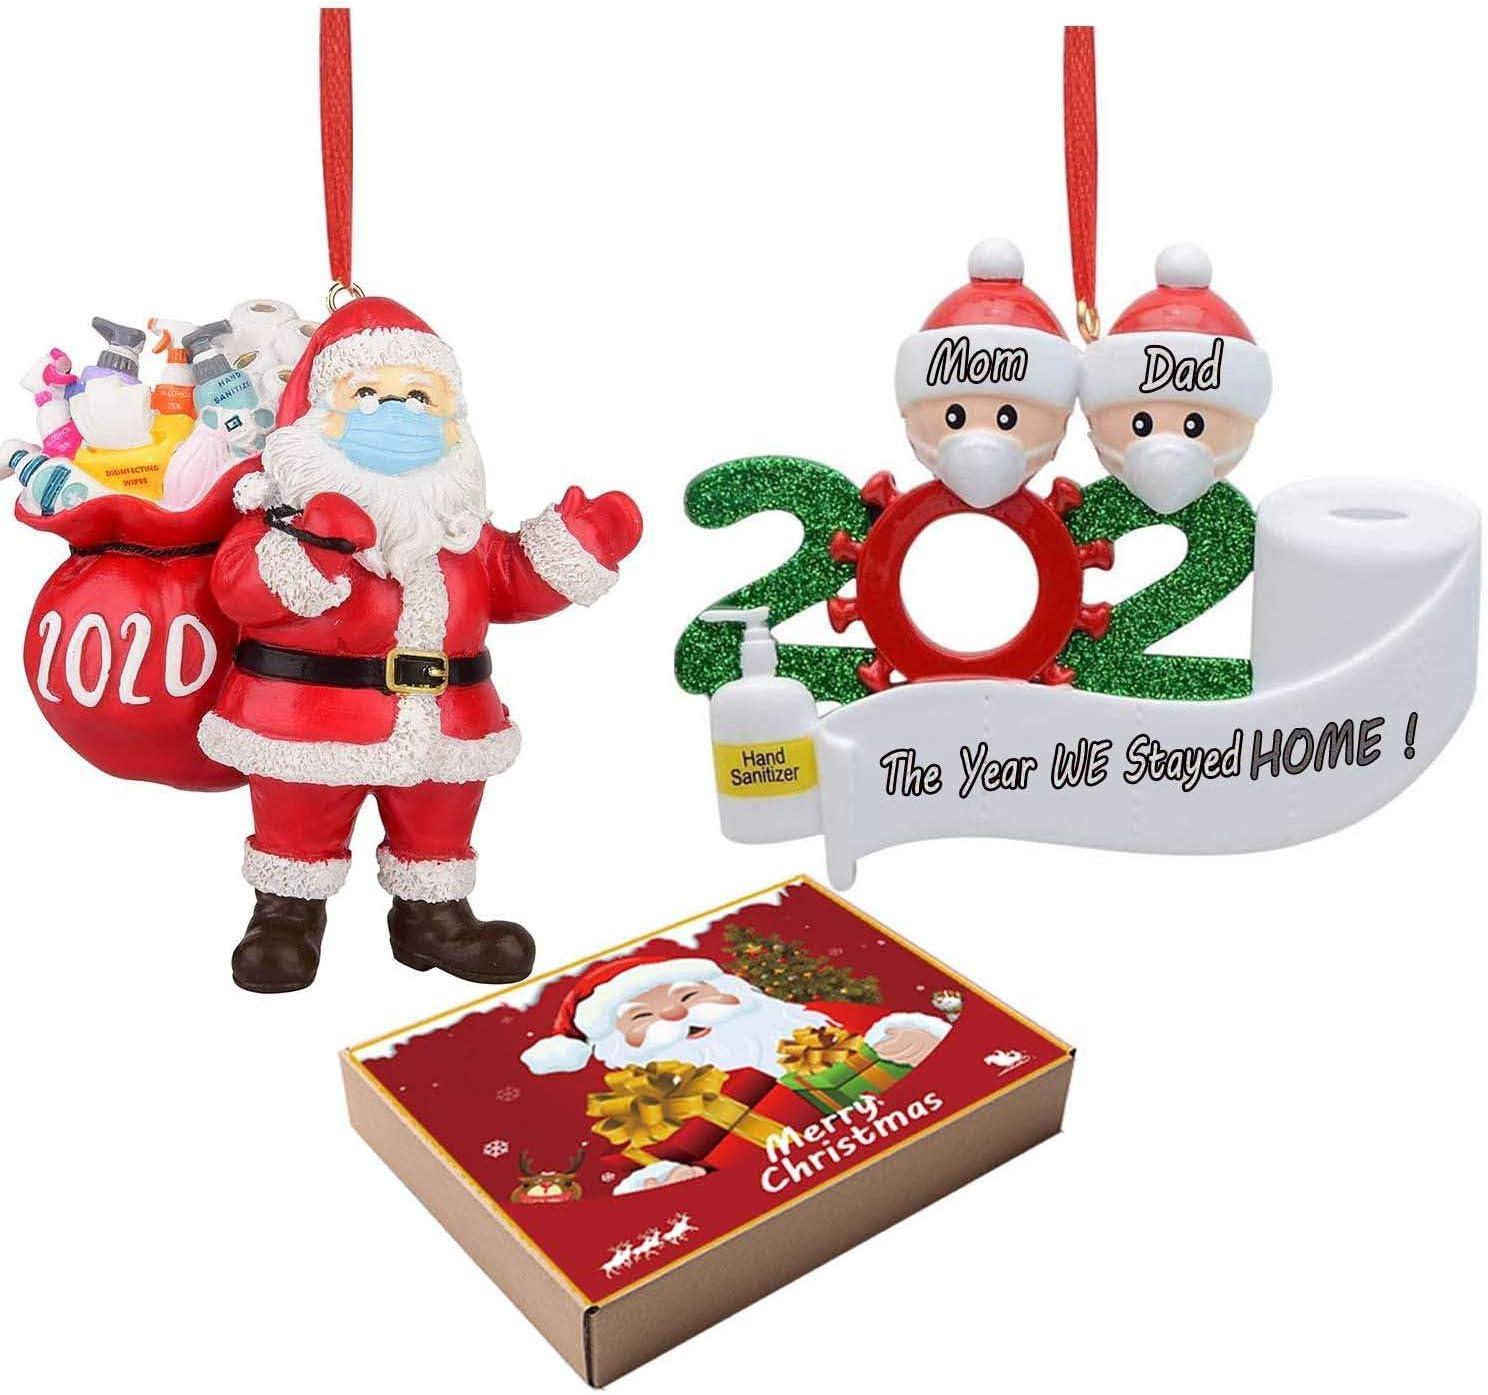 Merry Christmas 2020 3d Ornament Amazon.com: 3D 2020 Christmas Ornament Sets with Dog DIY Name